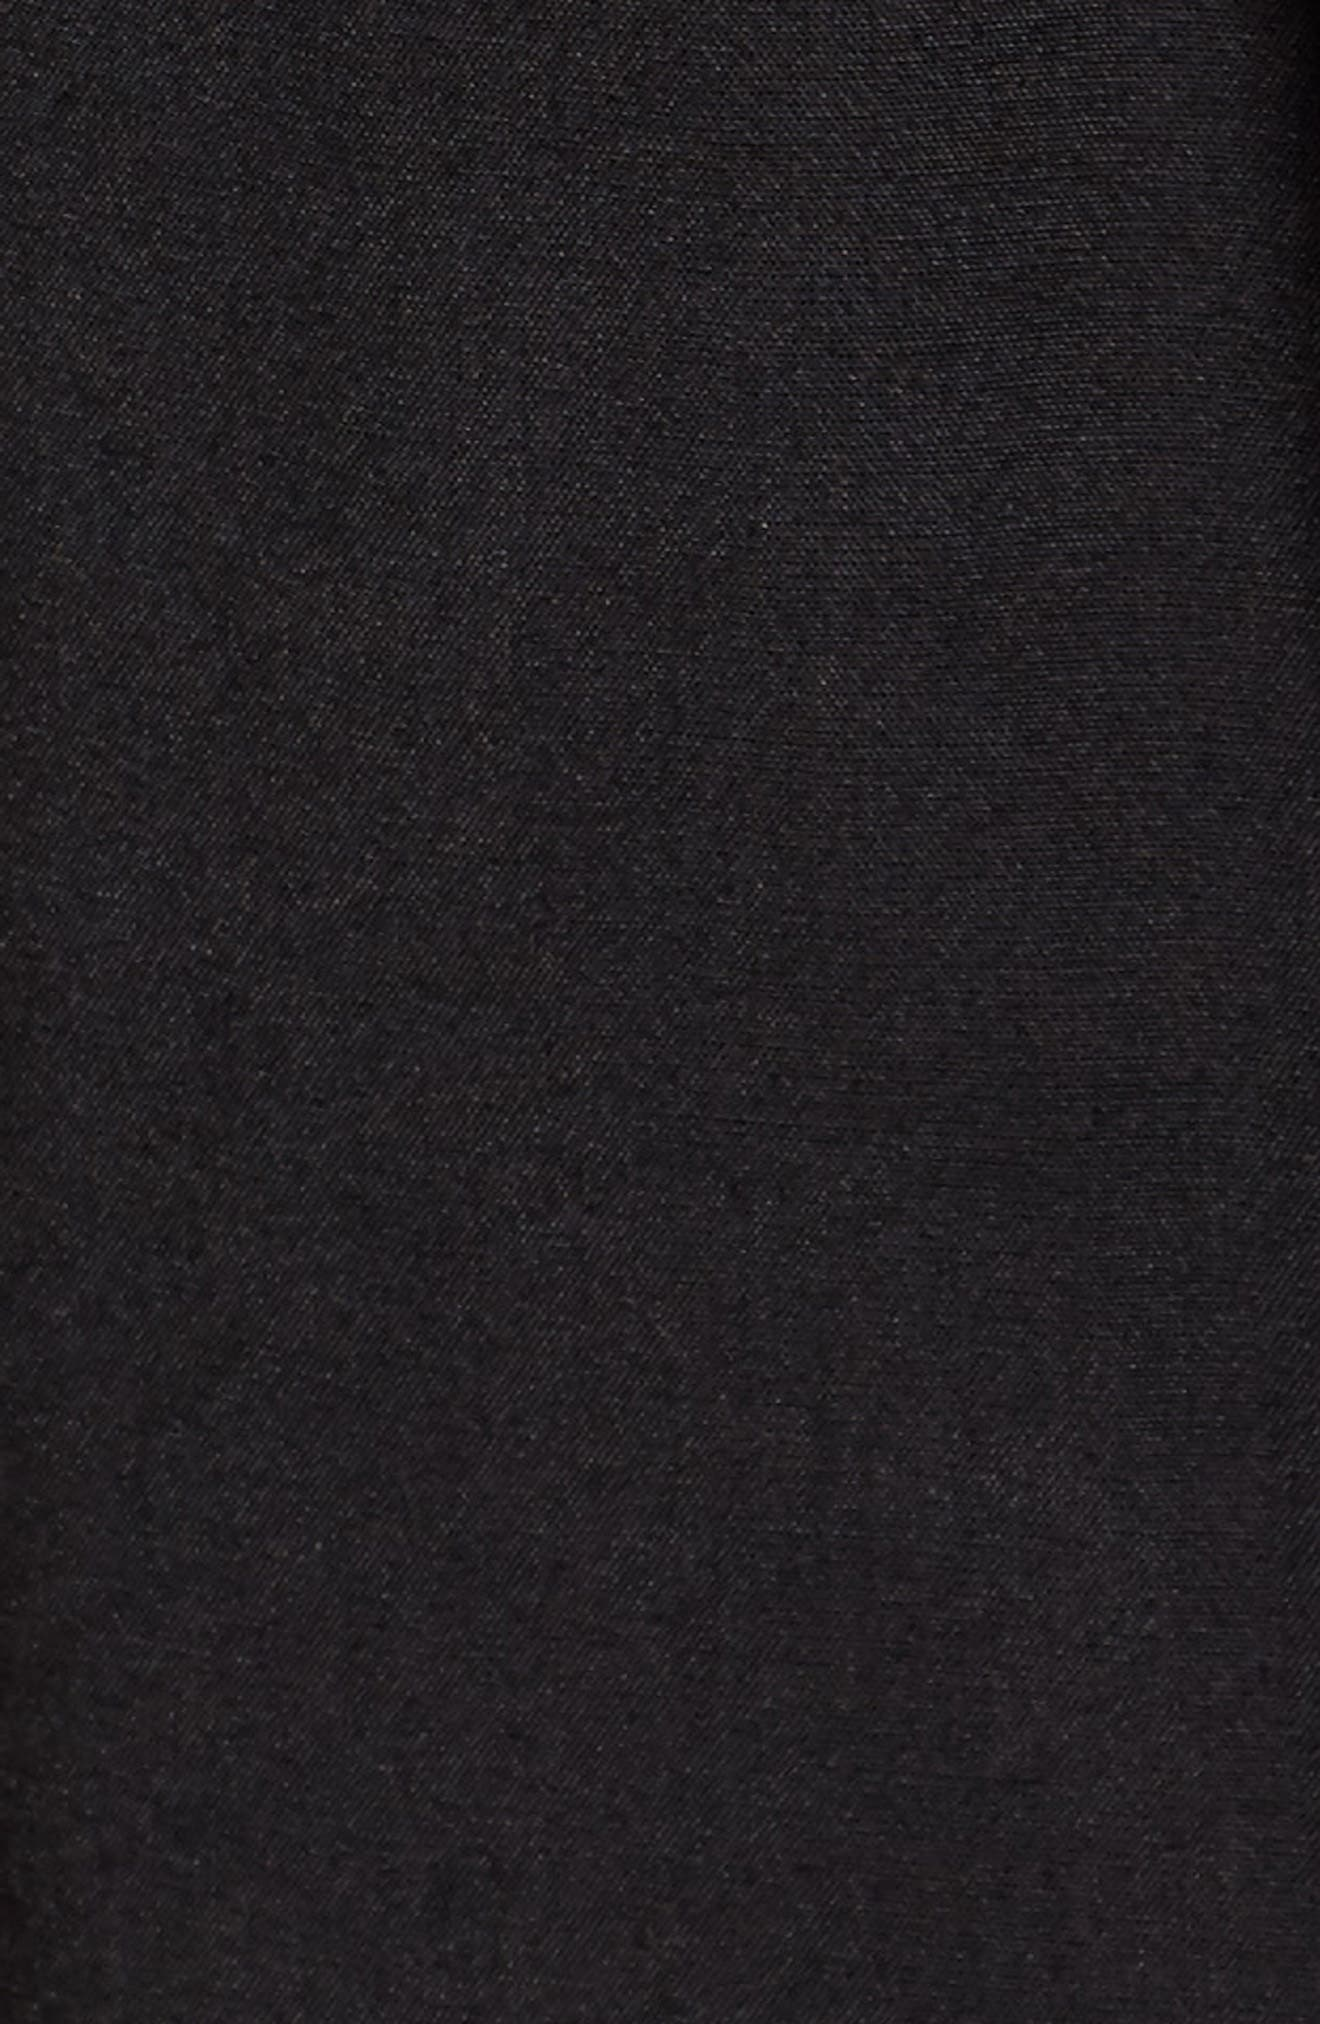 Embroidered Blouson Minidress,                             Alternate thumbnail 5, color,                             Black